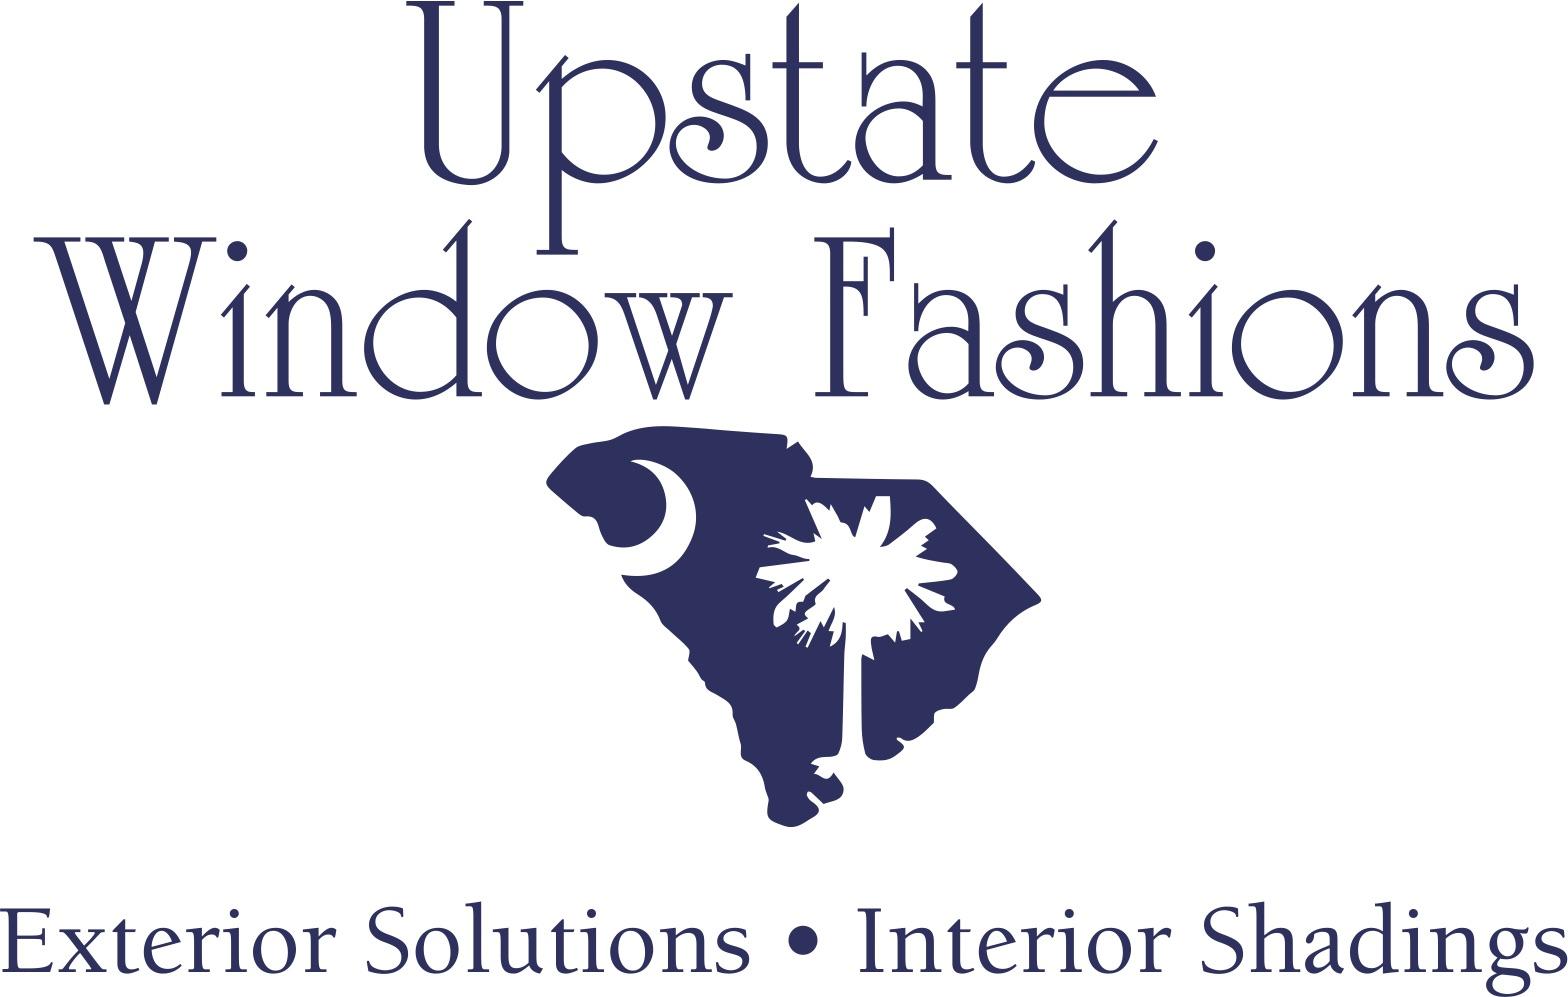 Upstate Window Fashions.jpg